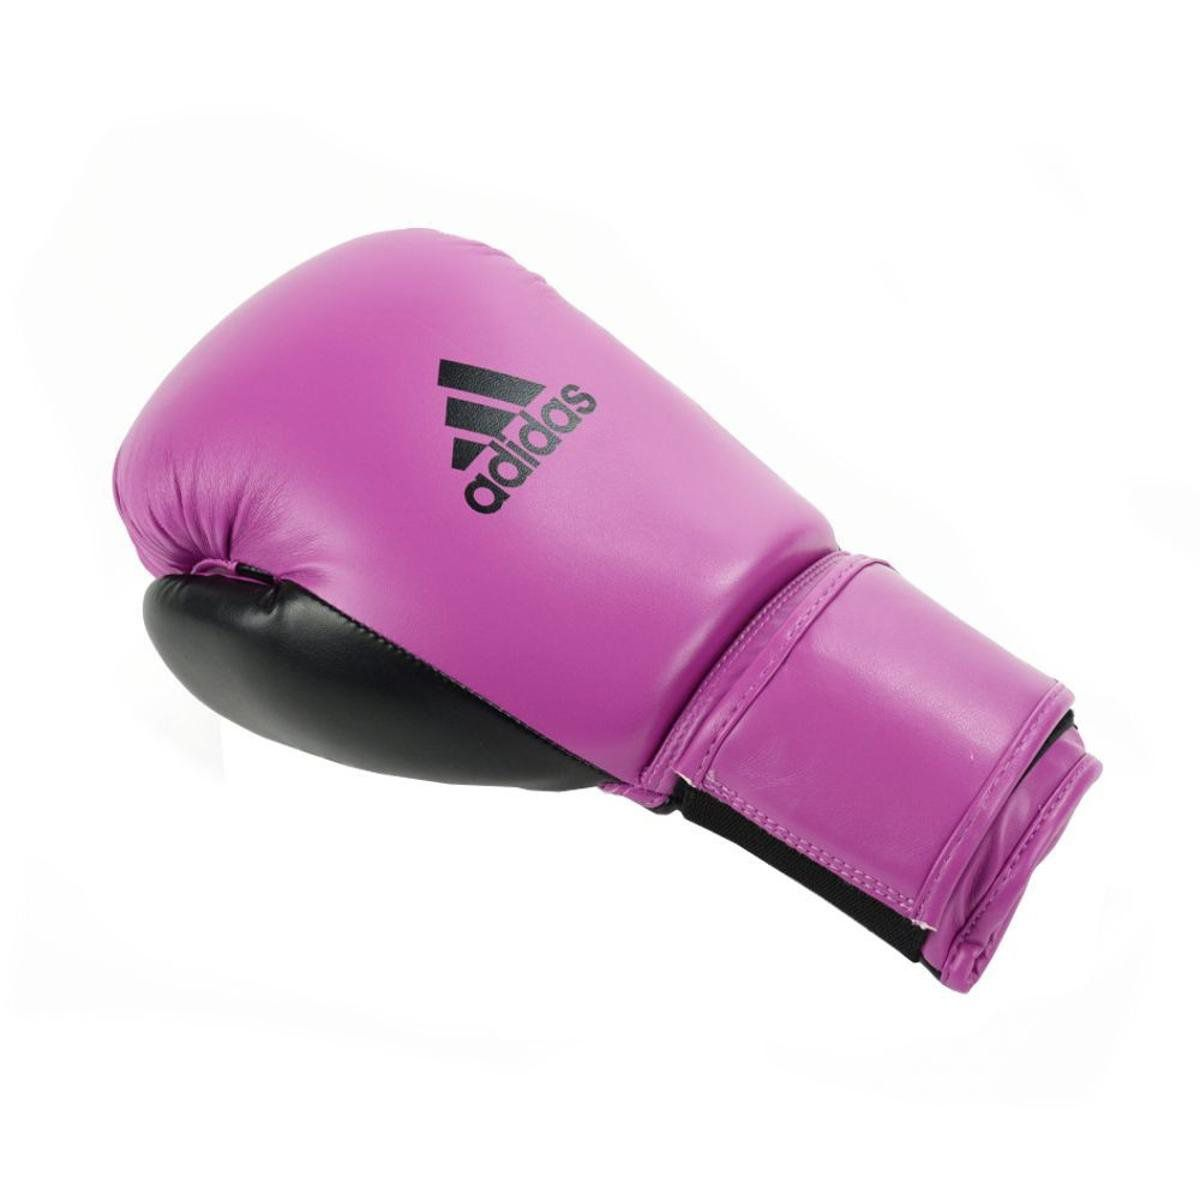 Luvas Boxe Muay Thai - Adidas Power 100 - Rosa - 14 OZ  - Loja do Competidor